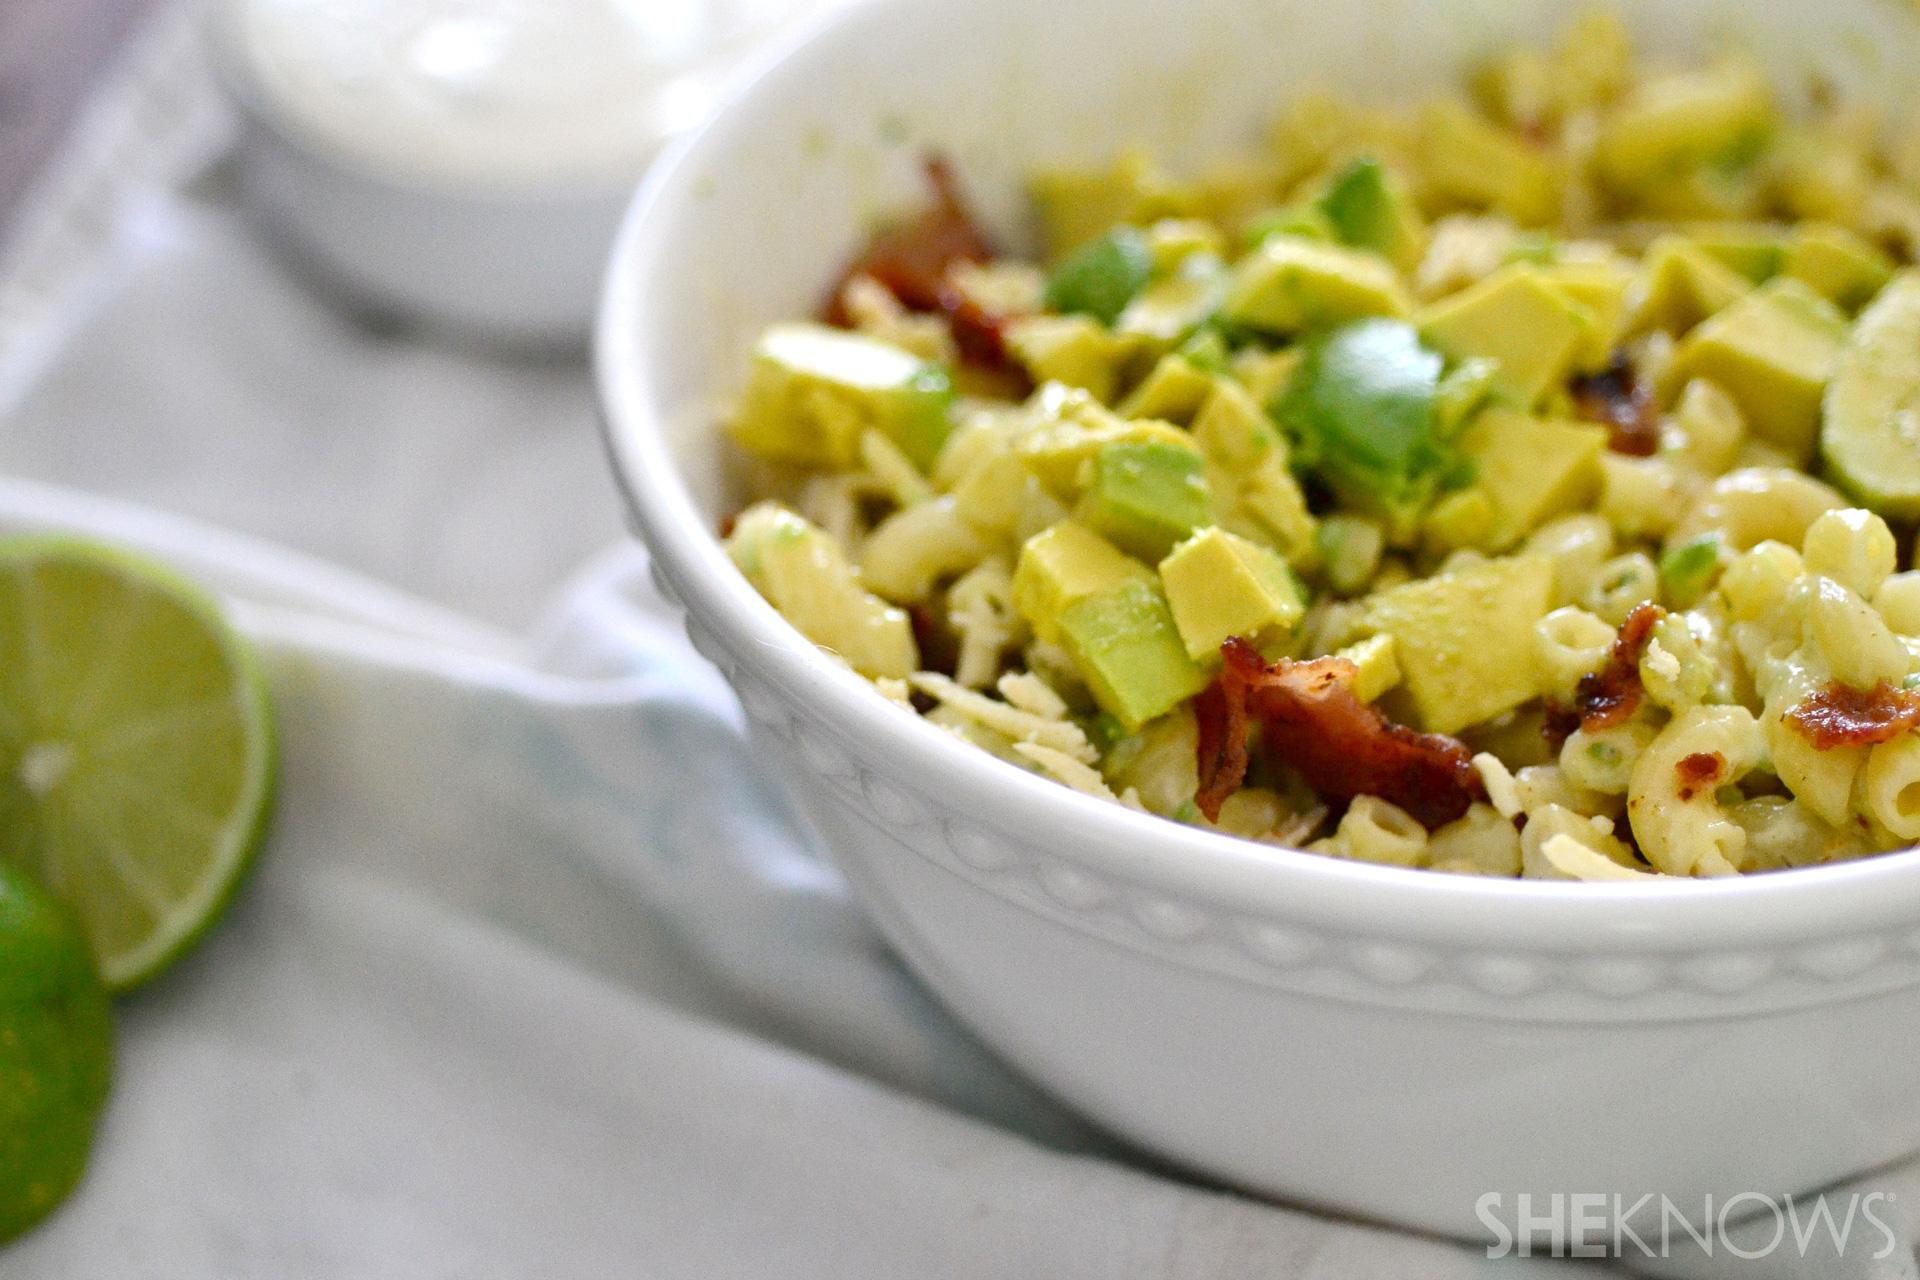 Decadent pasta salad recipes you'll love this summer